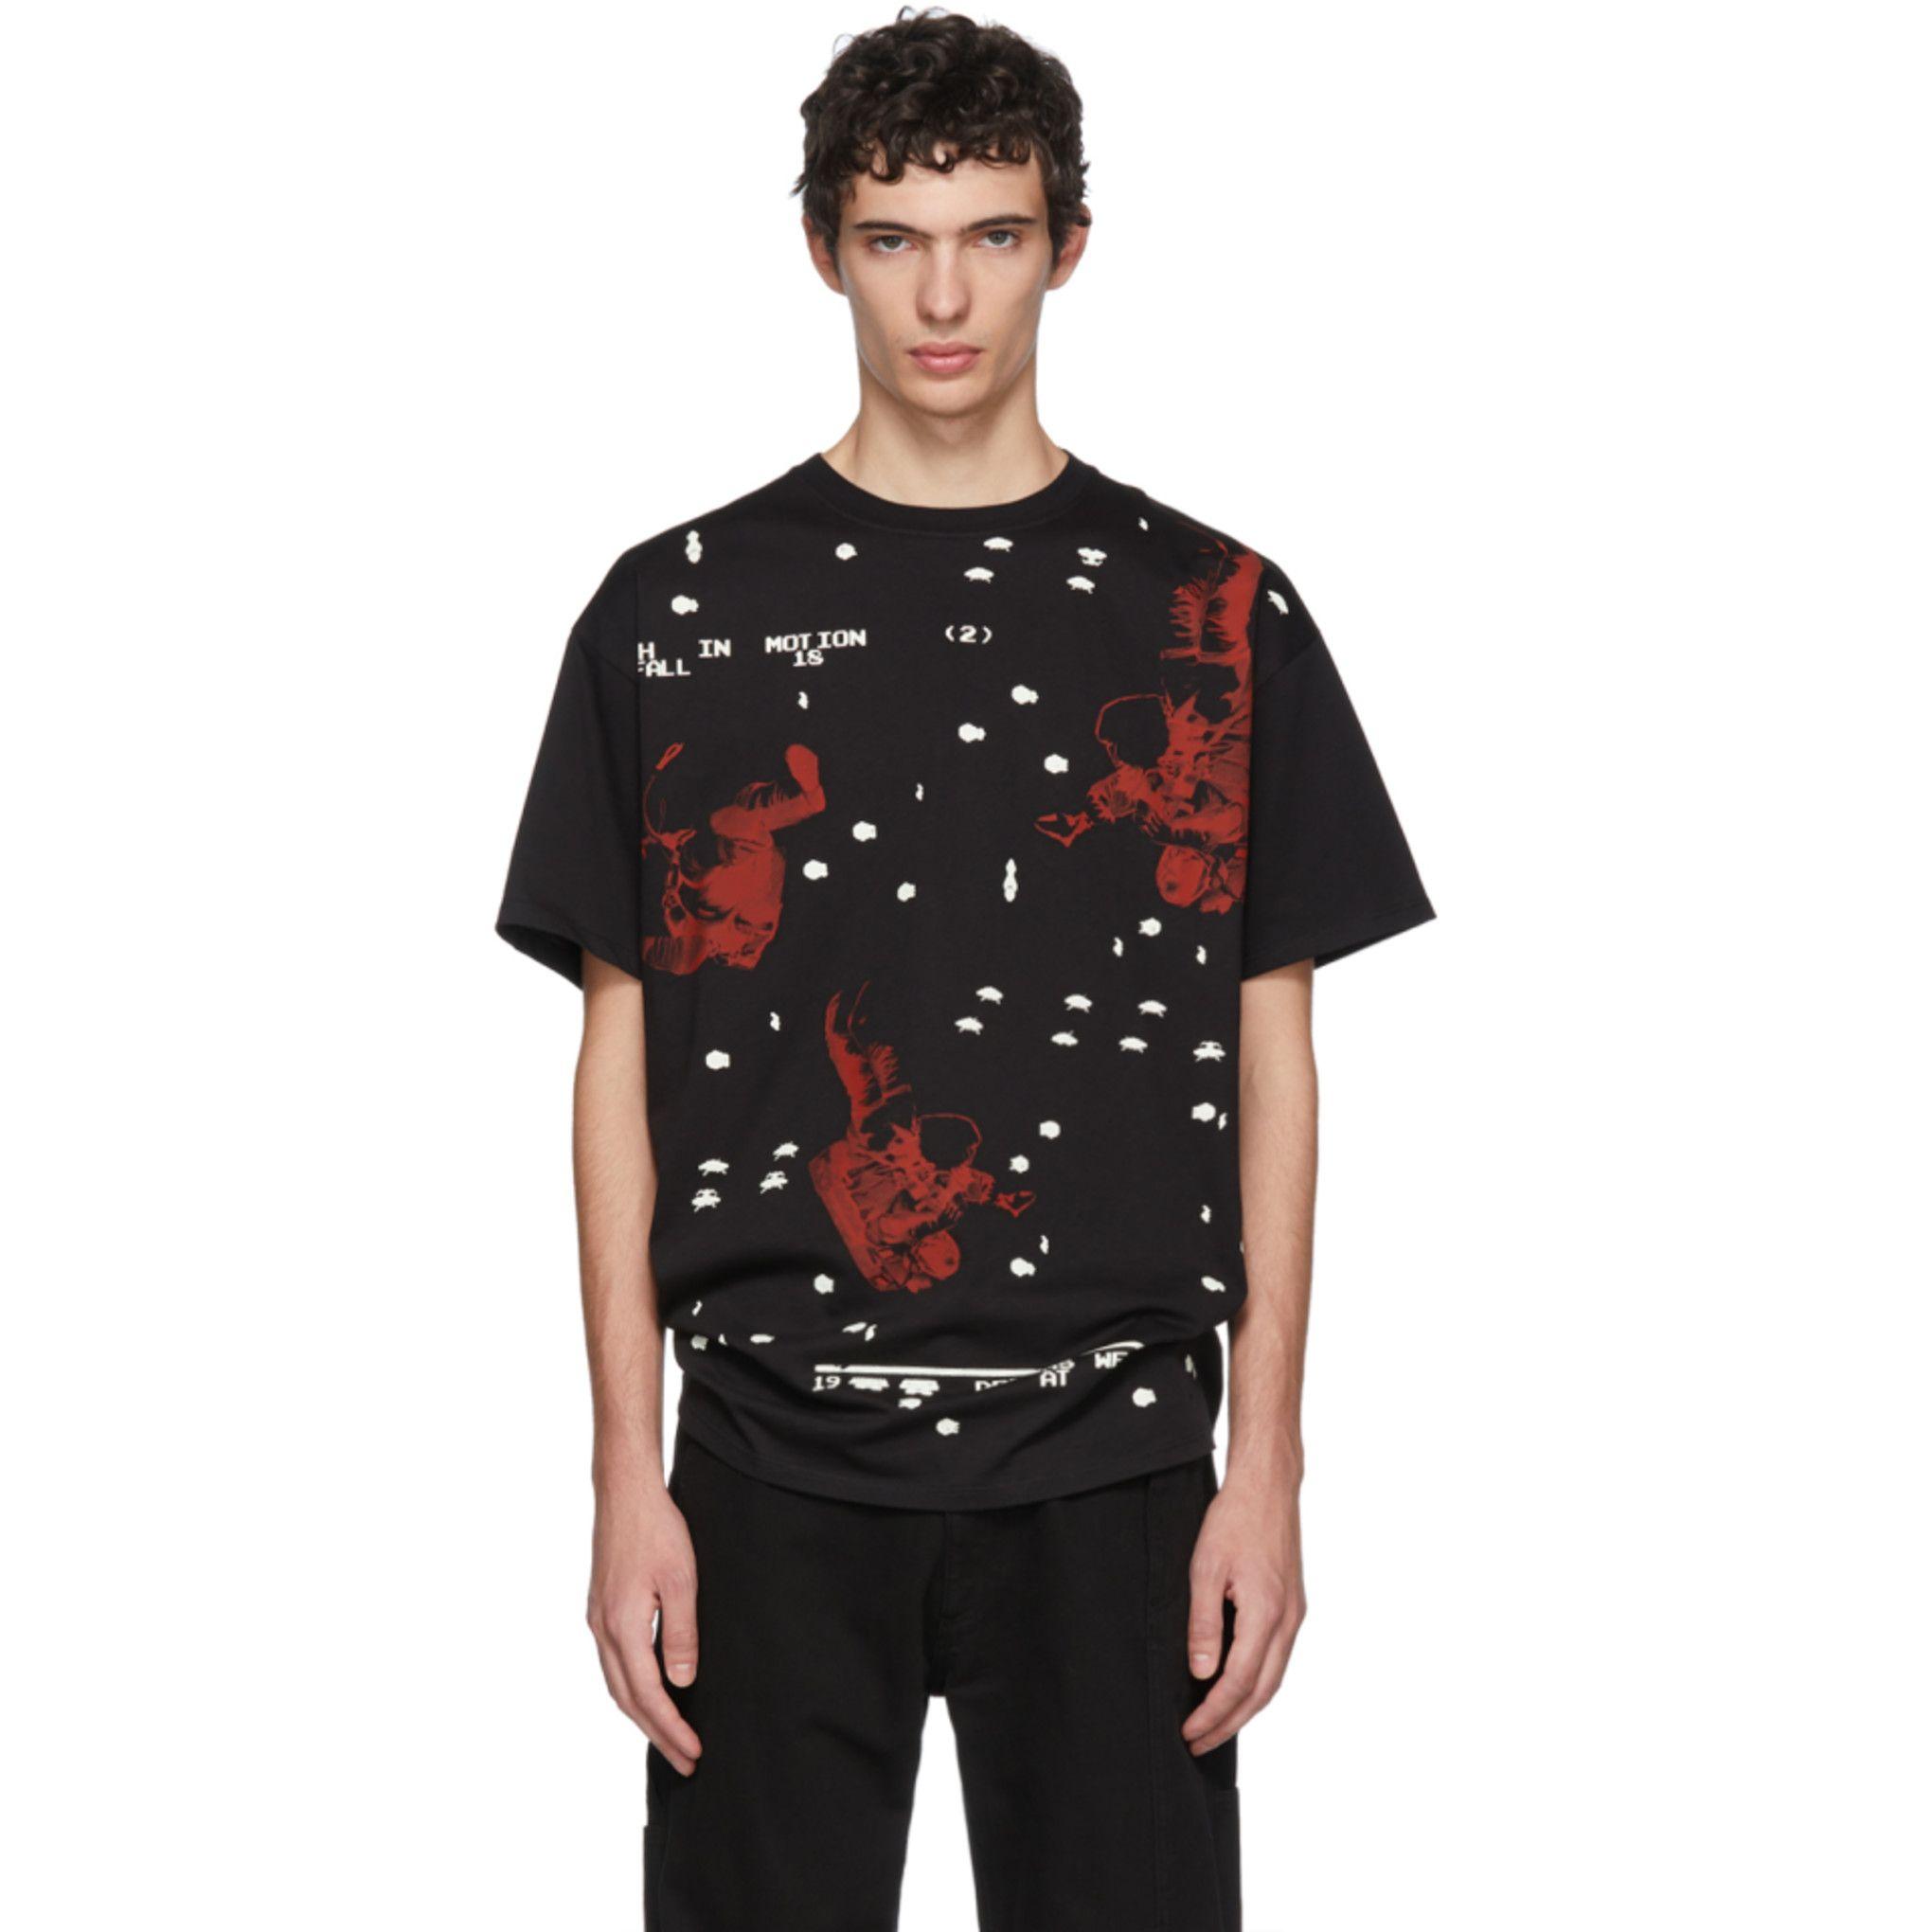 626f3e9f2 Raf Simons - Black Regular Fit Astronaut T-Shirt | Fashion | Raf ...